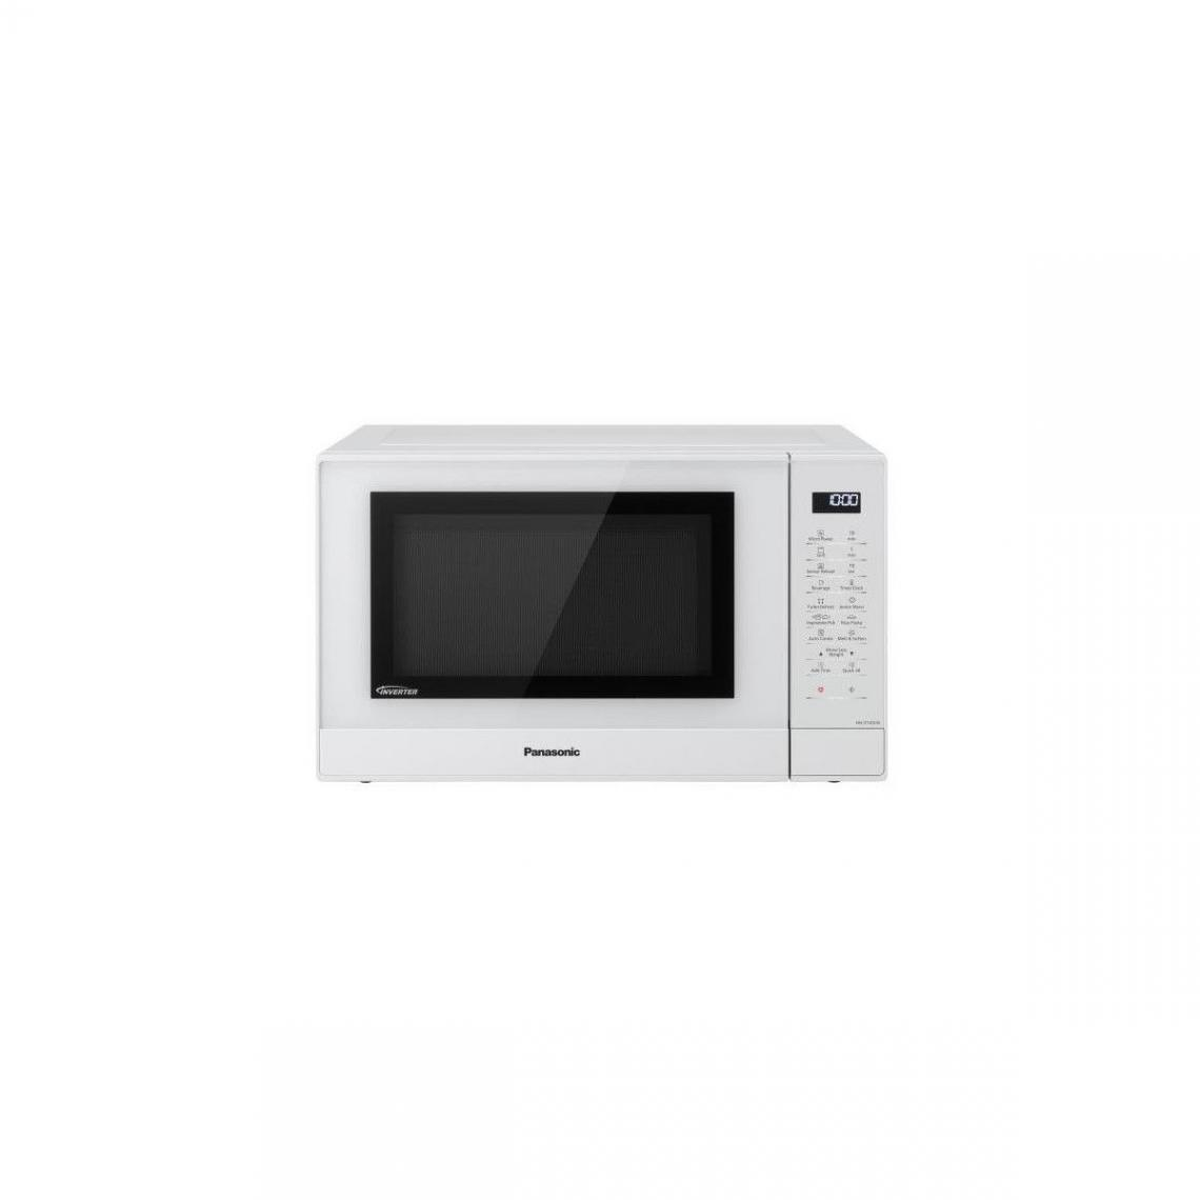 Panasonic Micro-ondes Pose Libre 31l Panasonic 1100w 53cm, Nn-gt45kwsug